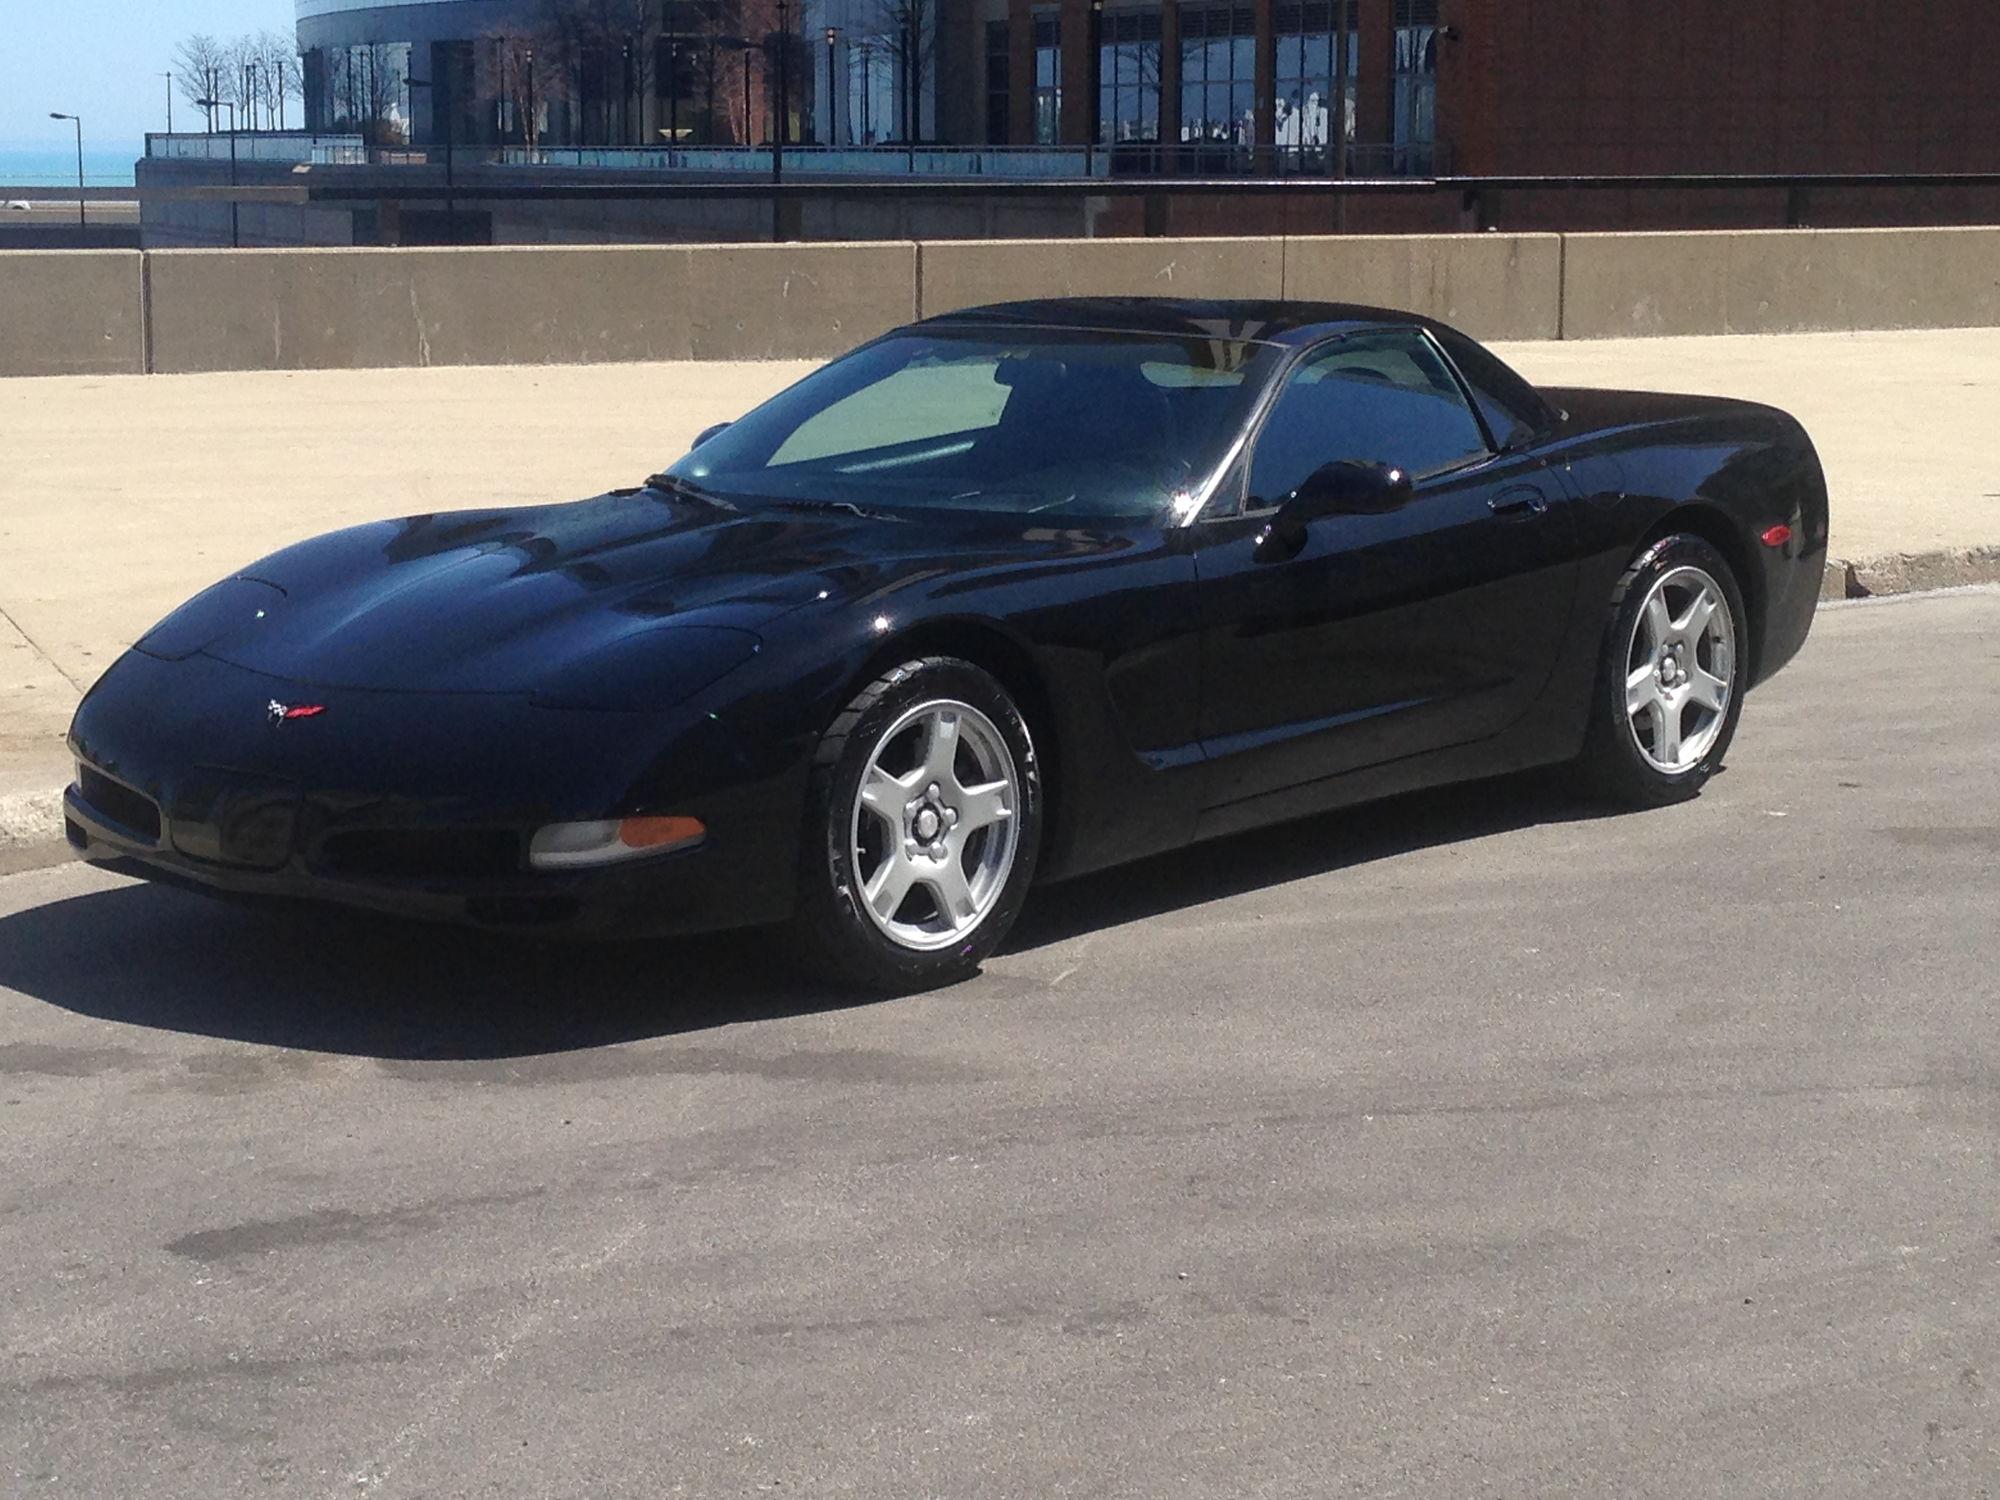 1999 corvette c5 z51 frc hardtop 51k miles 6 speed manual all stock 15 500. Black Bedroom Furniture Sets. Home Design Ideas